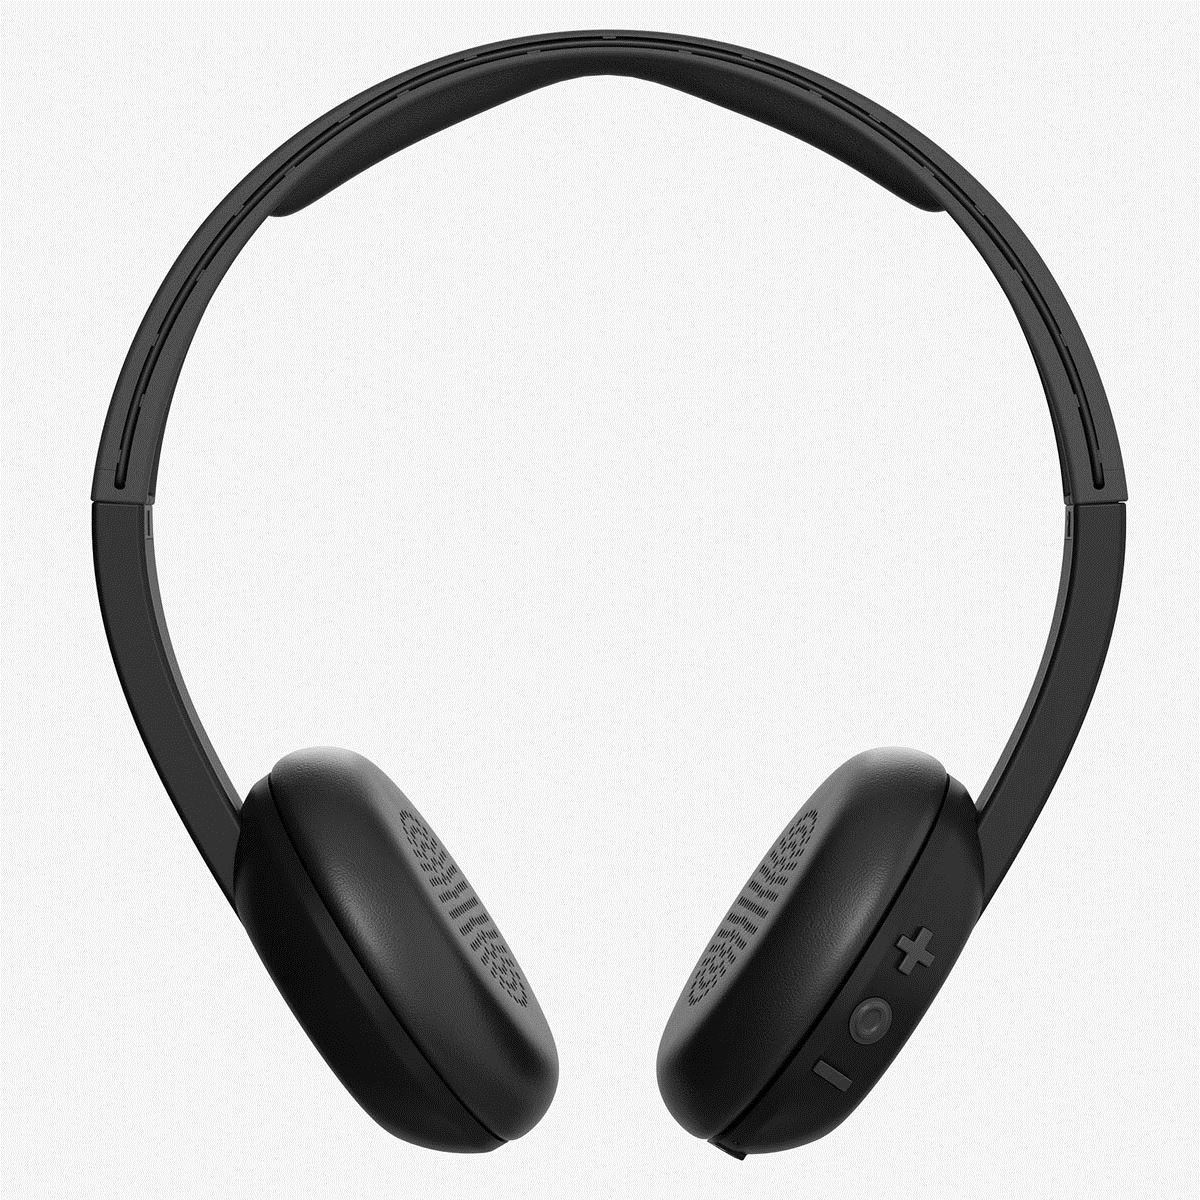 Audífonos Skullcandy Uproad Bluetooth Negro